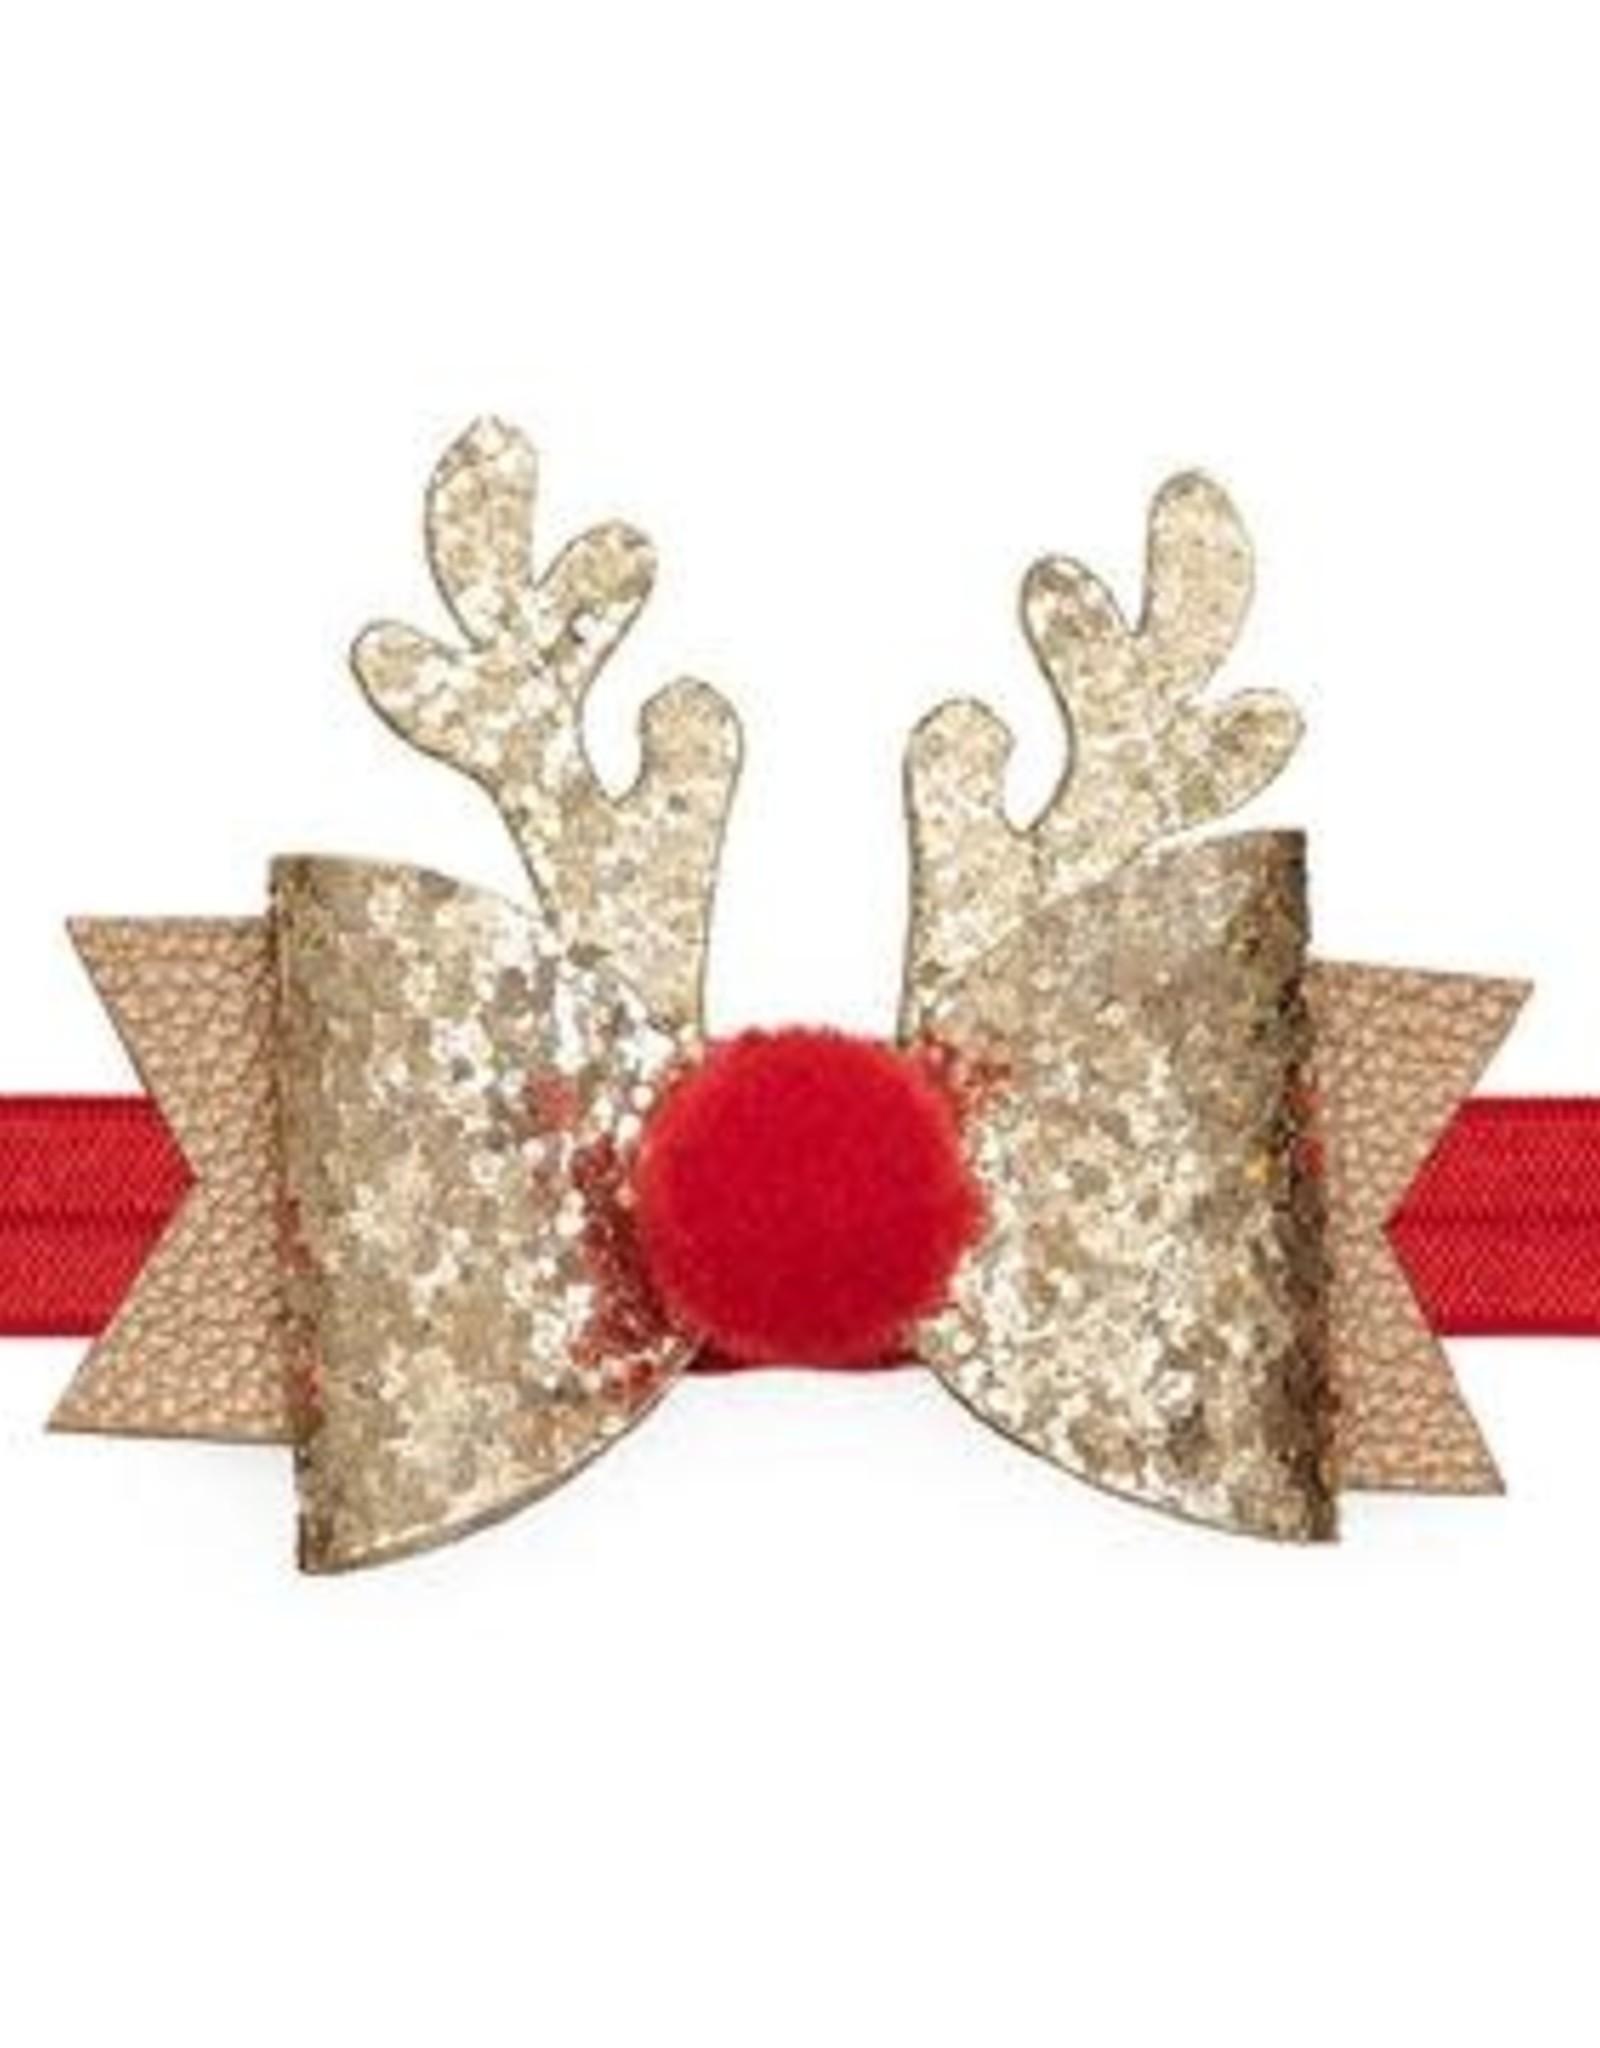 Reindeer Nose Soft Headband